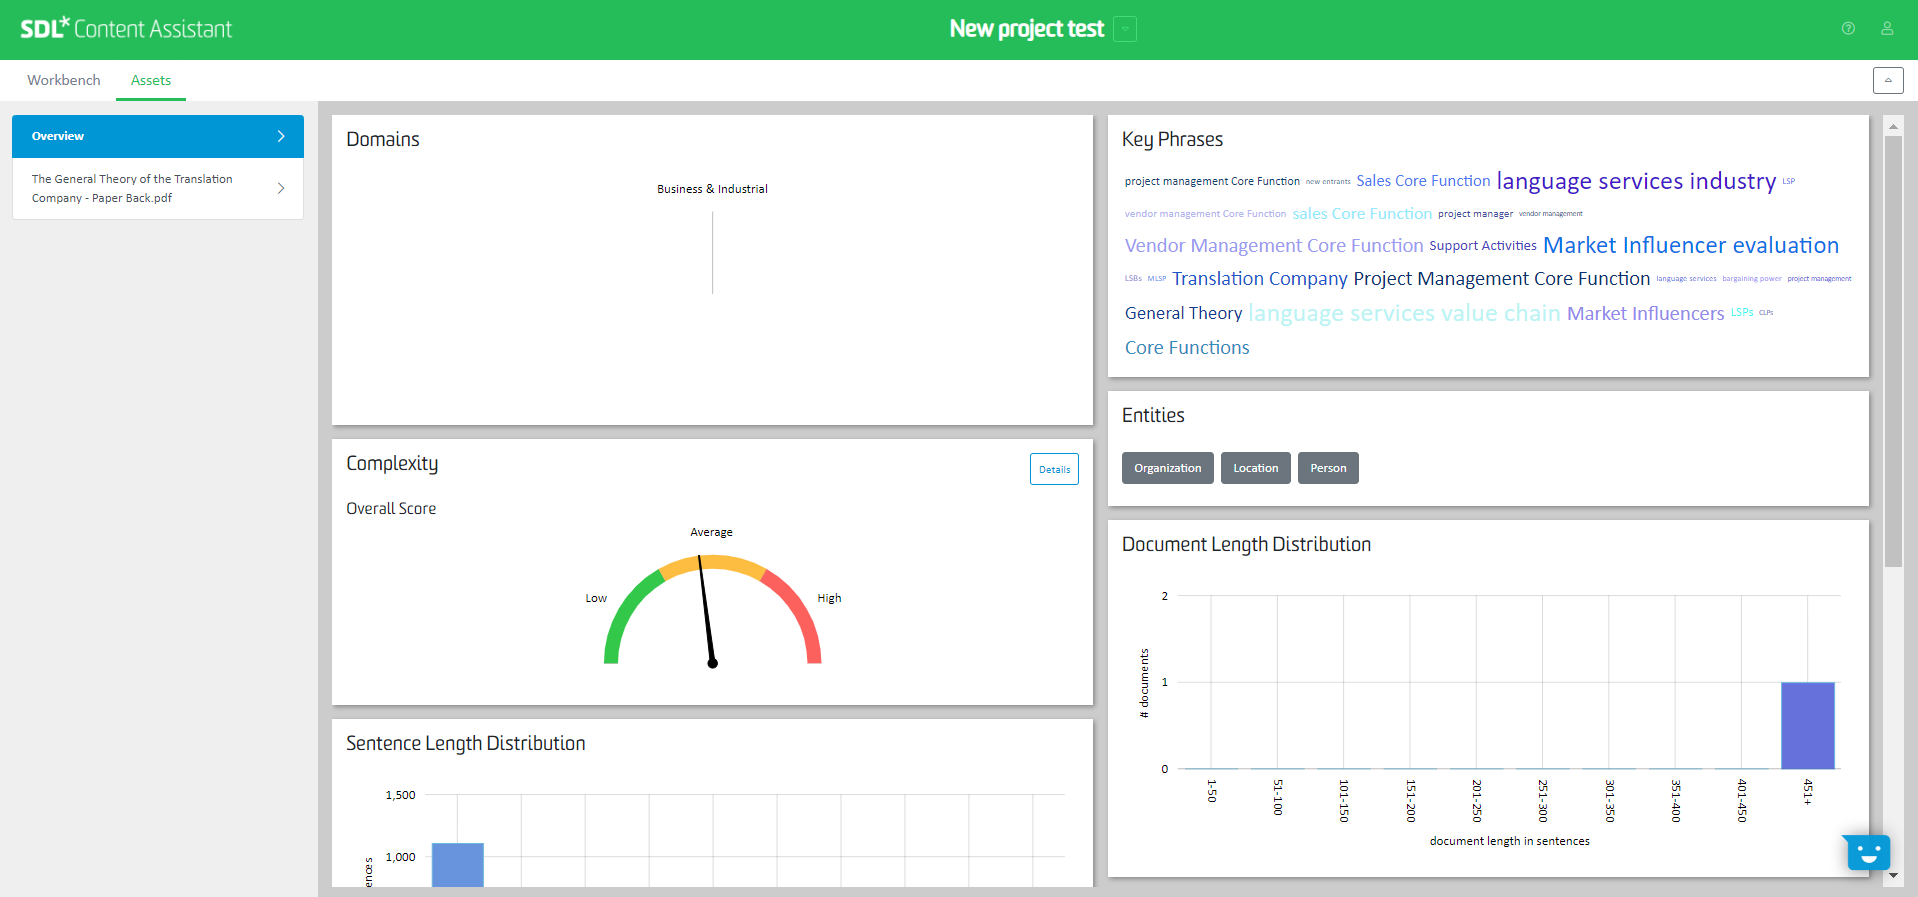 Nimdzi Analyzes the SDL Content Assistant Tool 02